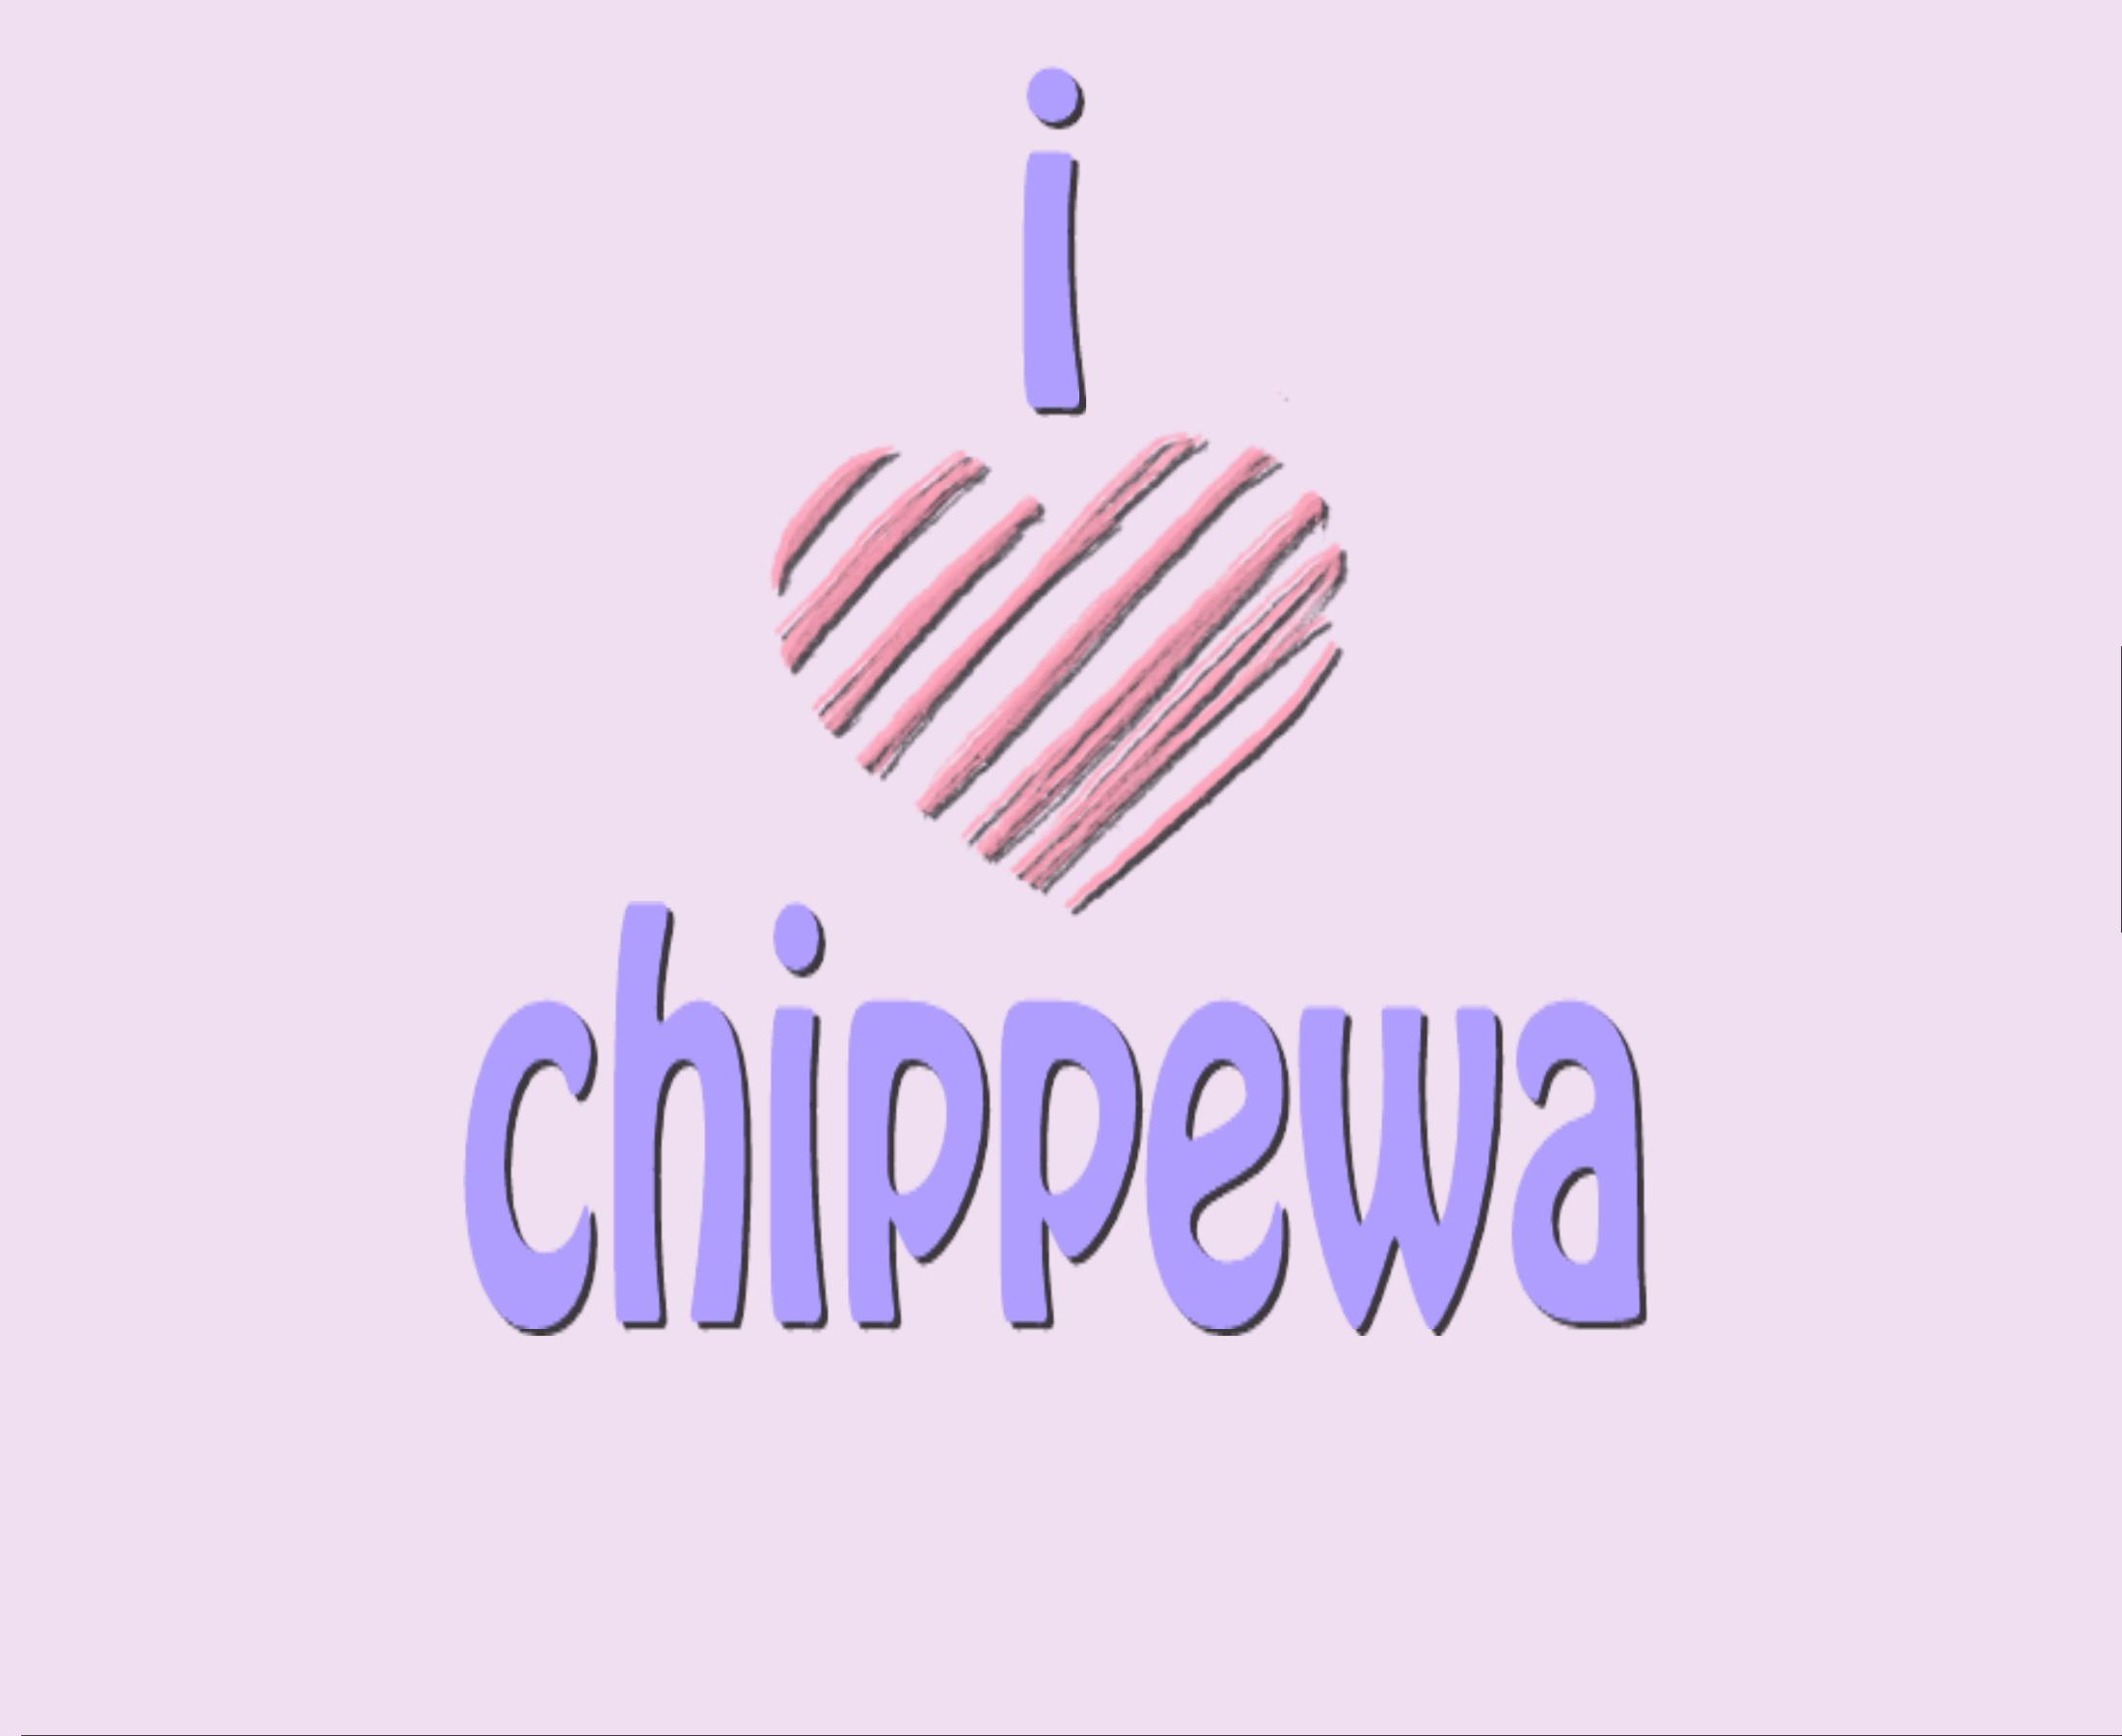 I HEART CHIPPEWA (1)